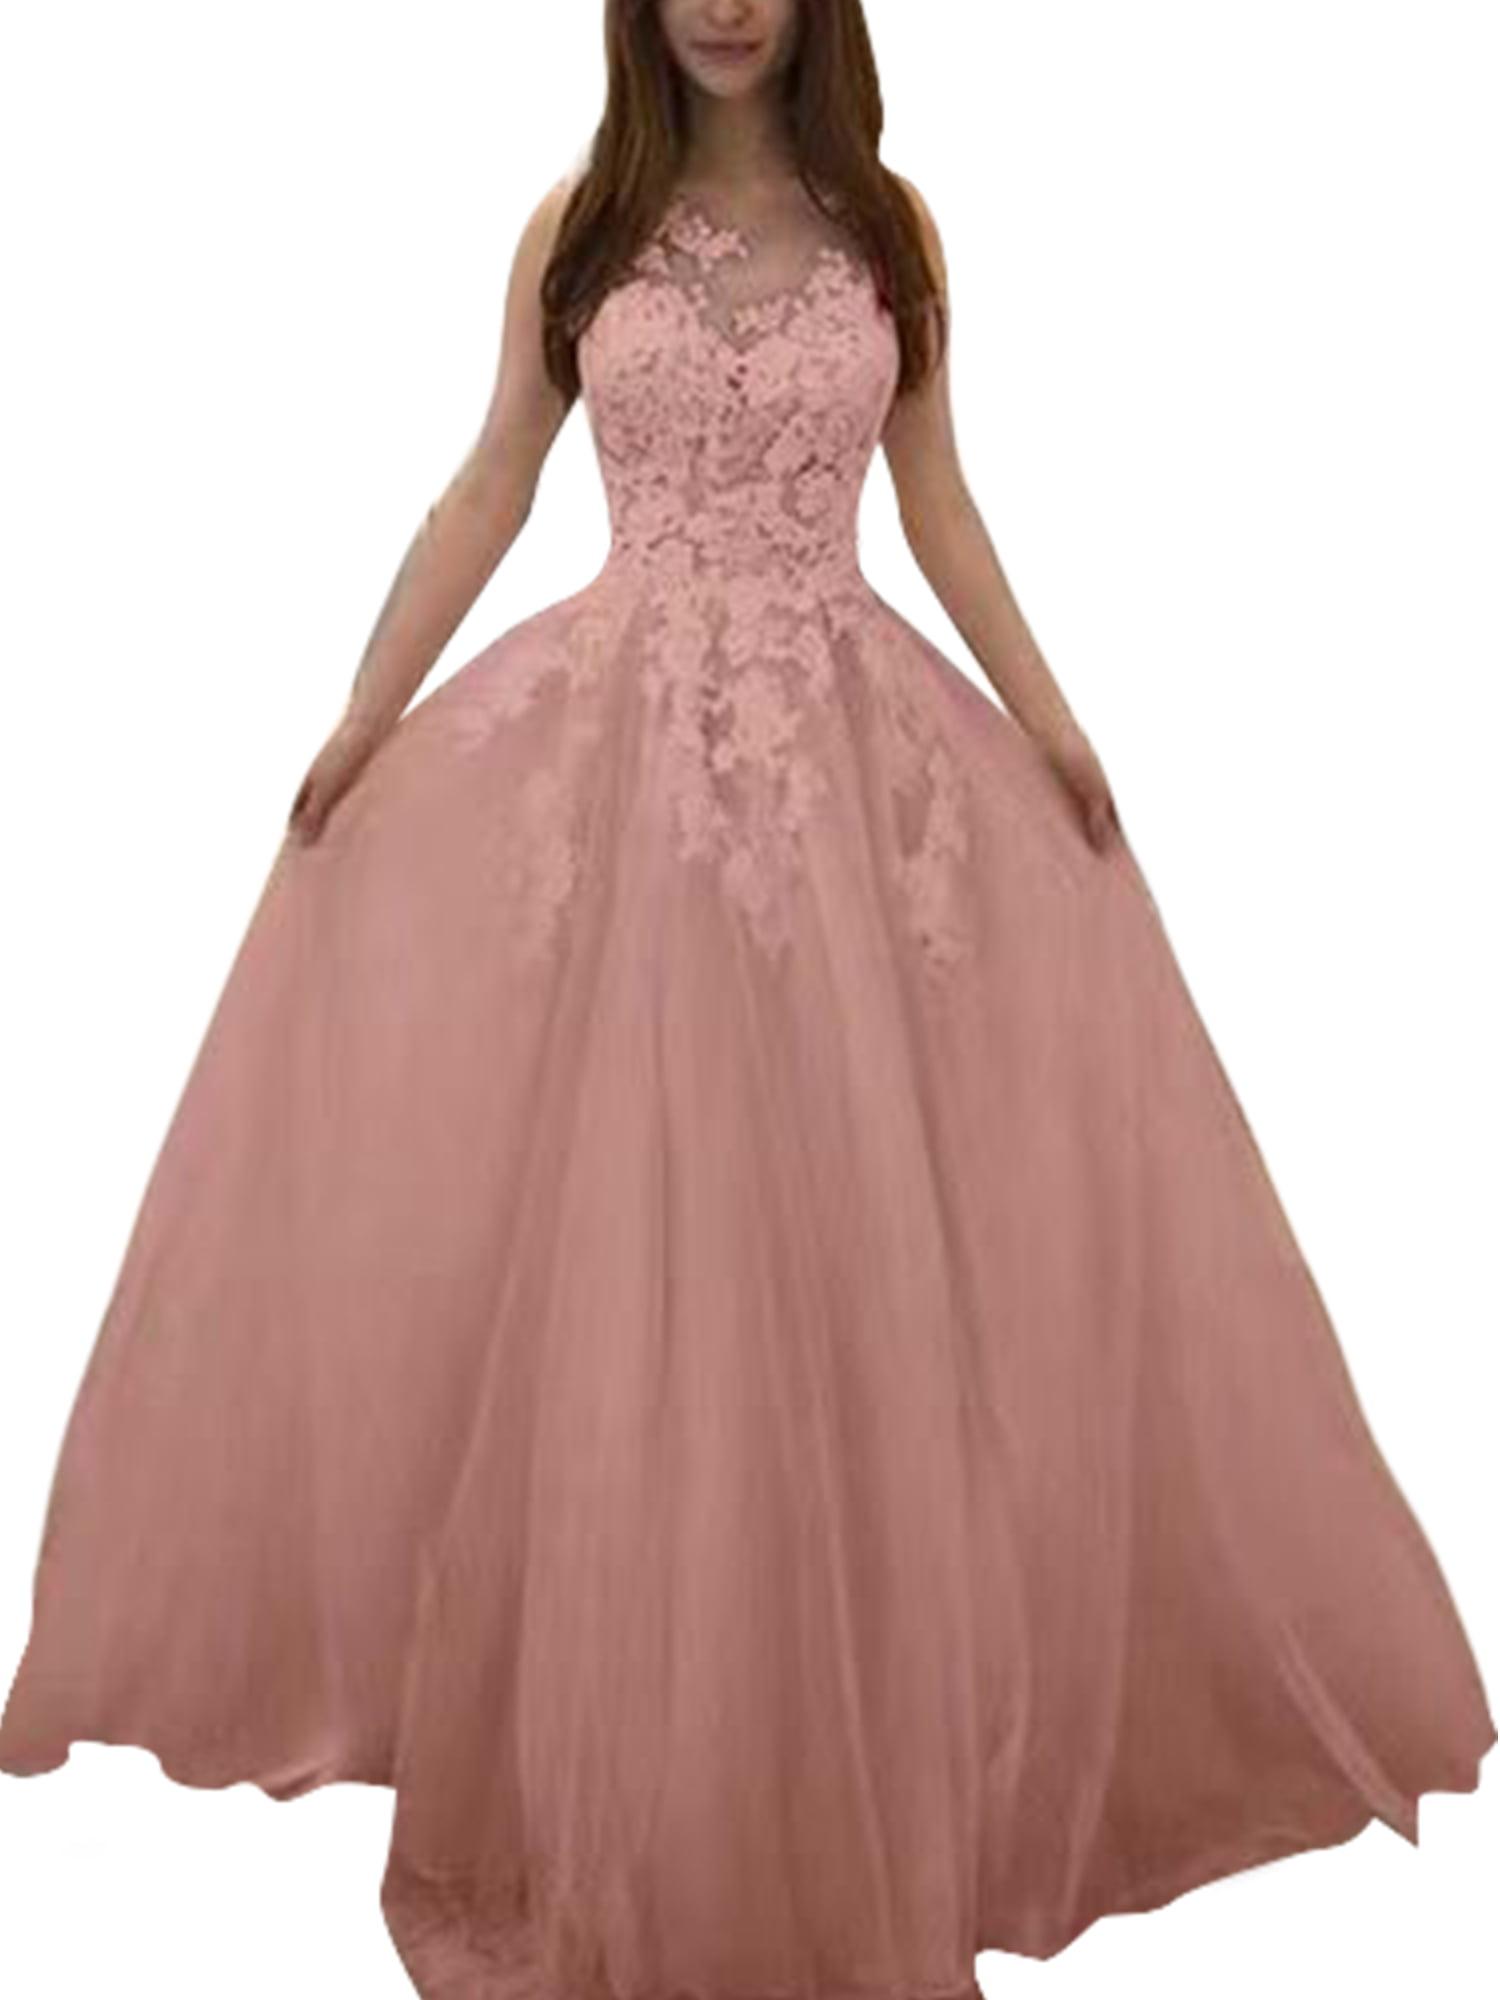 Pink dress Pink Lace Long Bridesmaid dress Wedding Dress Long Prom dress Party dress Cocktail dress Maxi dress Evening Gown